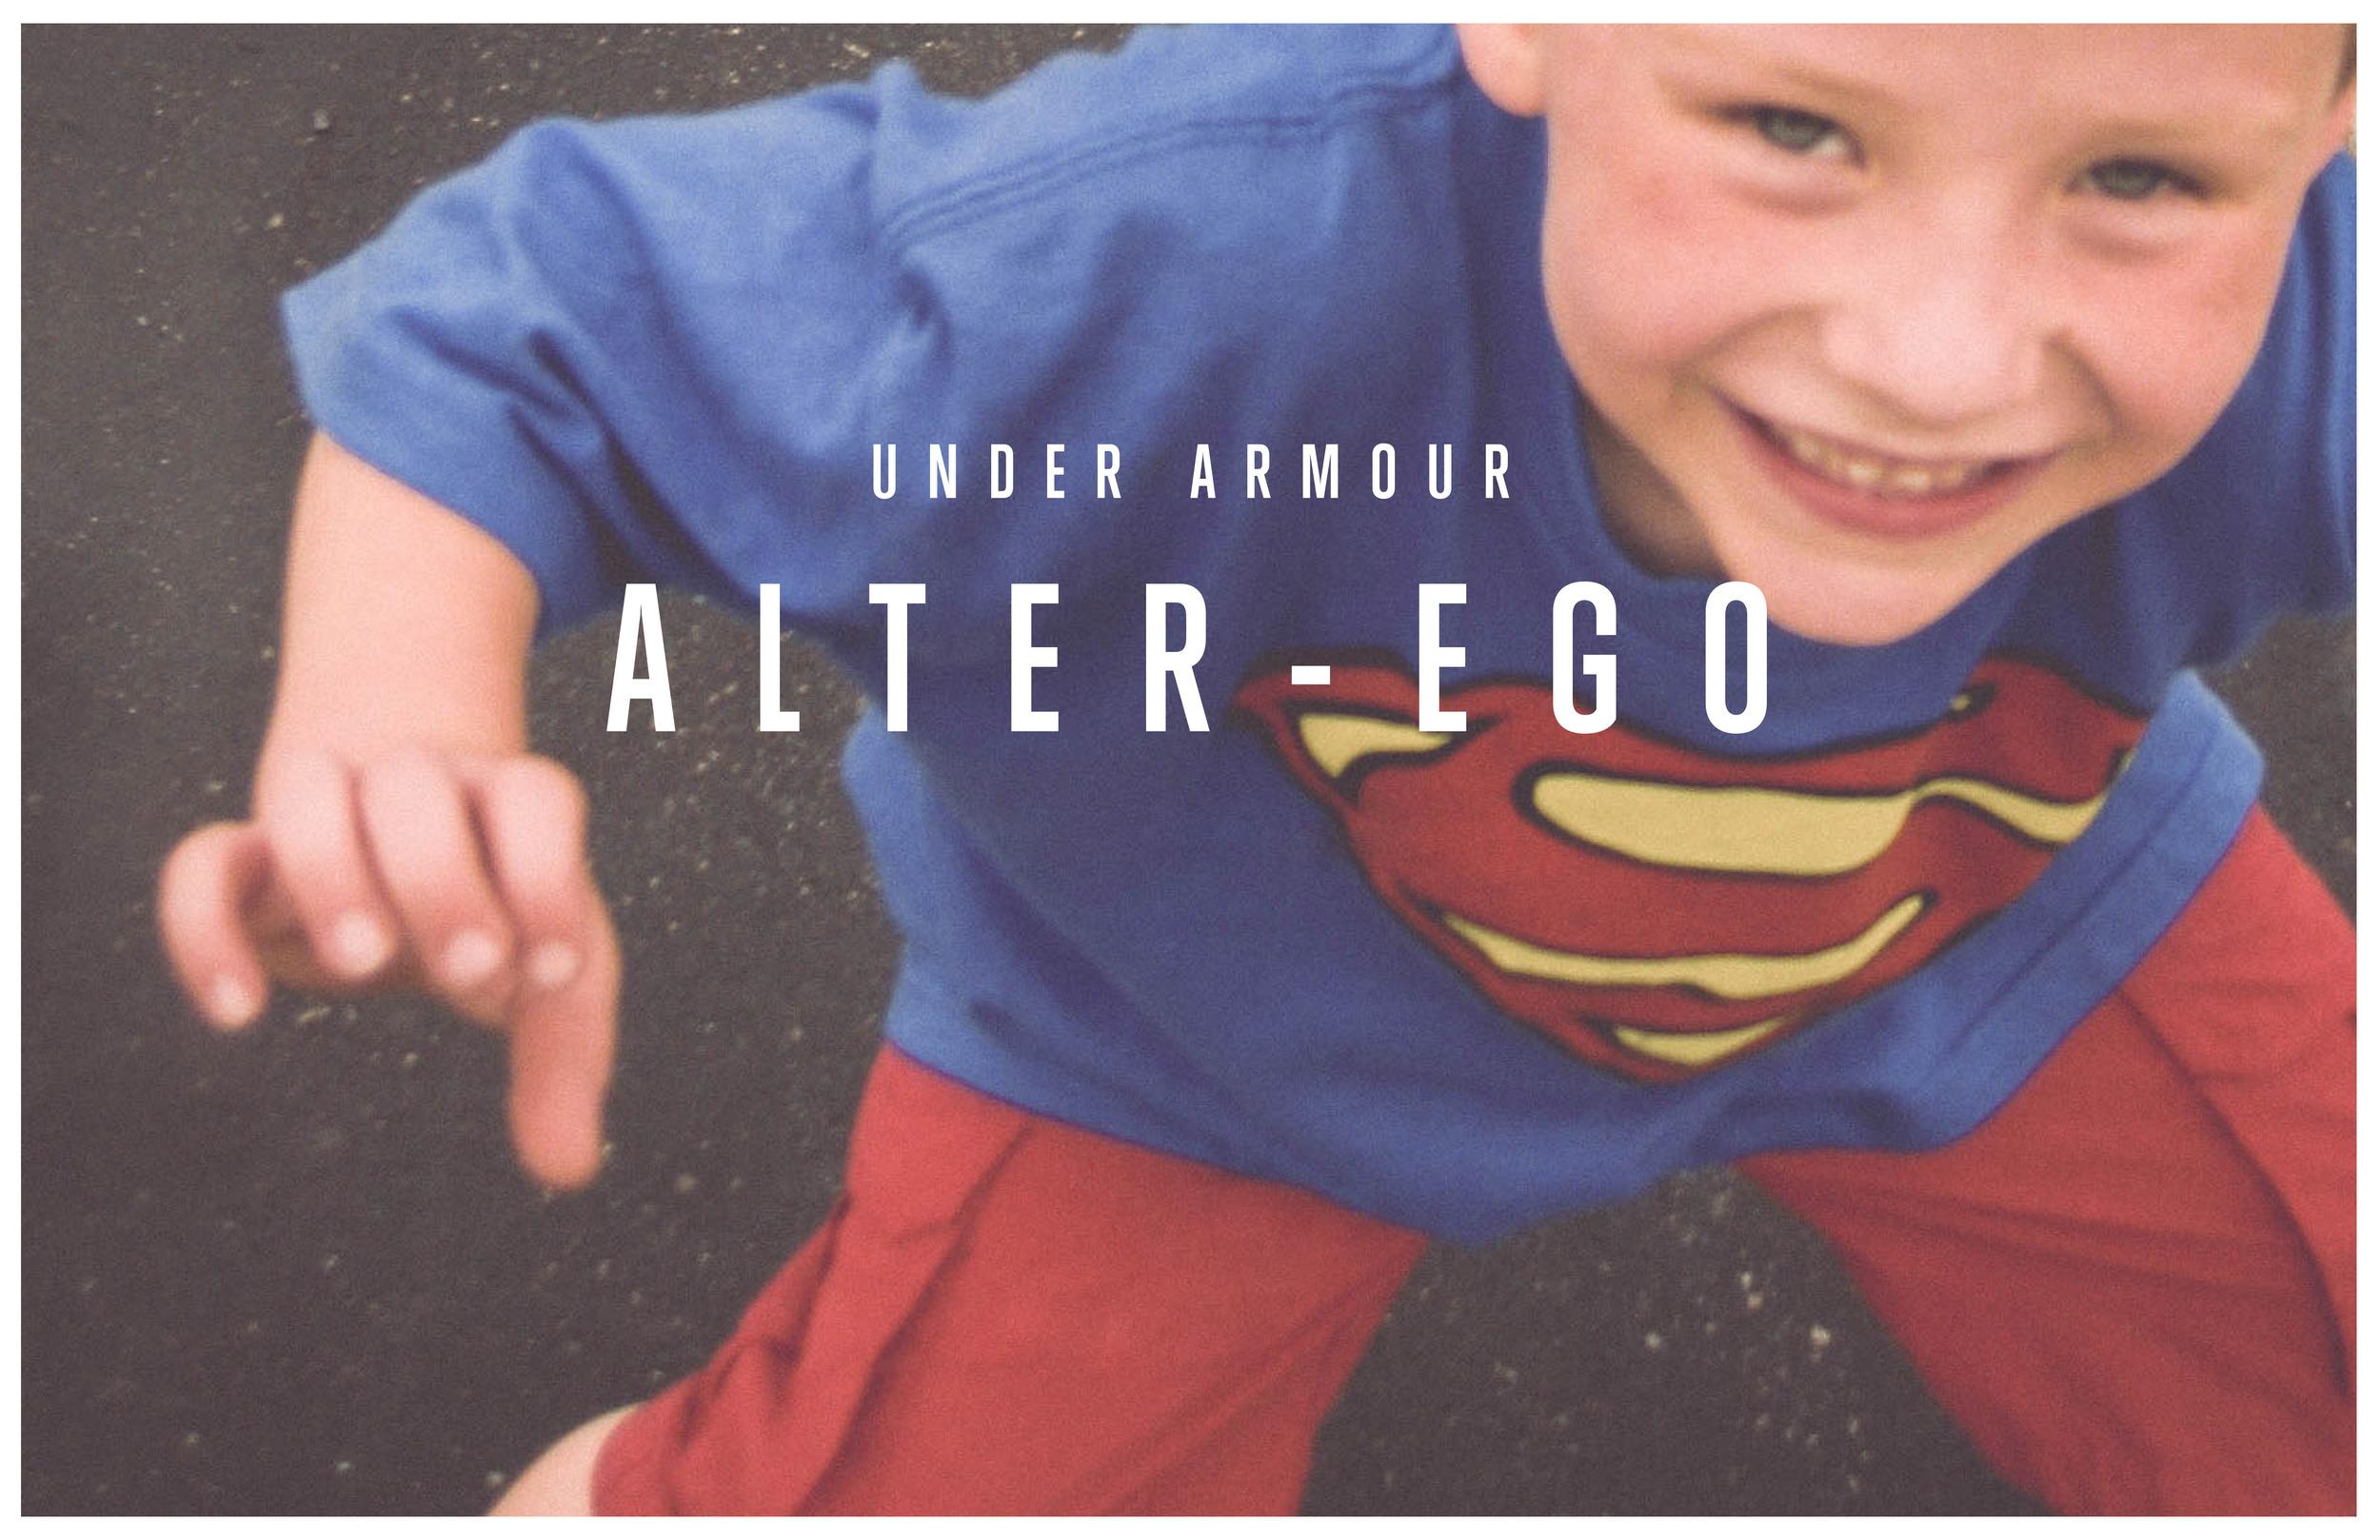 UnderArmourAlterEgo[1]-1.jpg